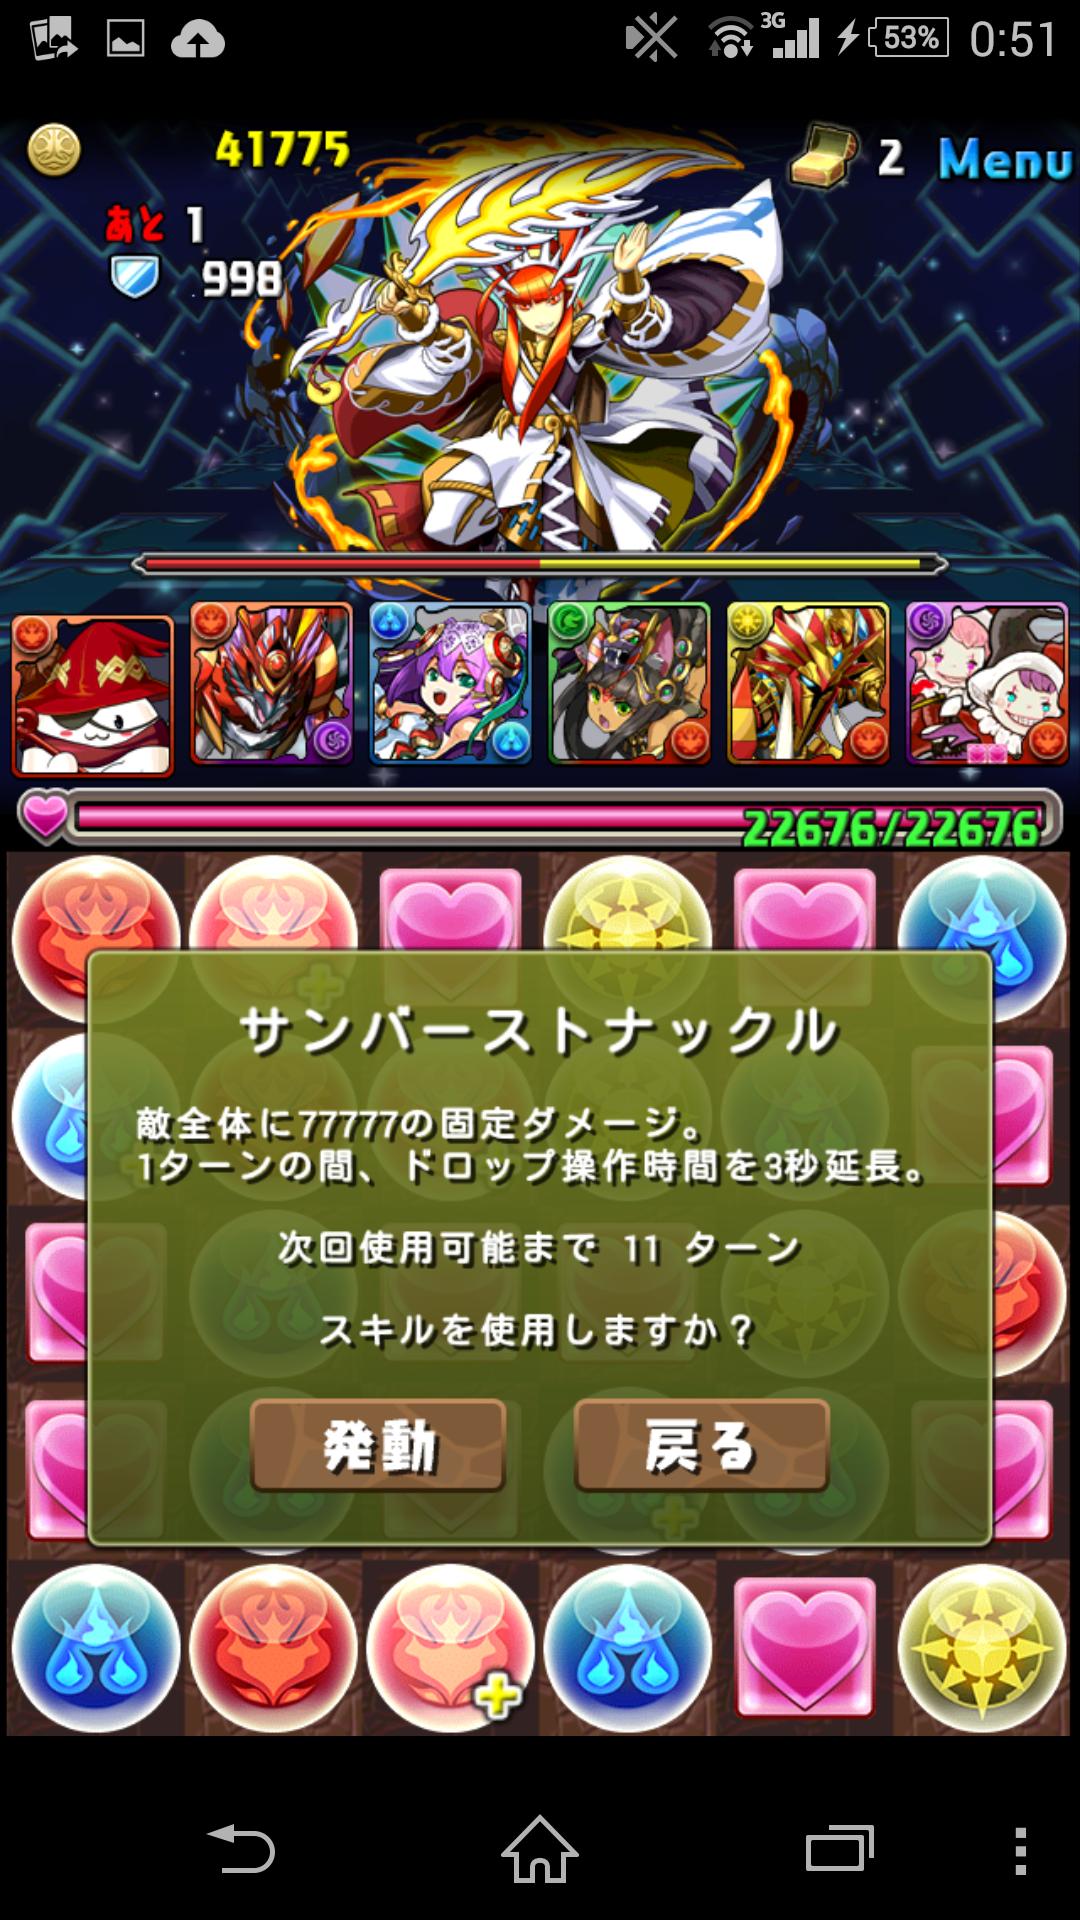 Screenshot_2015-04-10-00-51-55.png